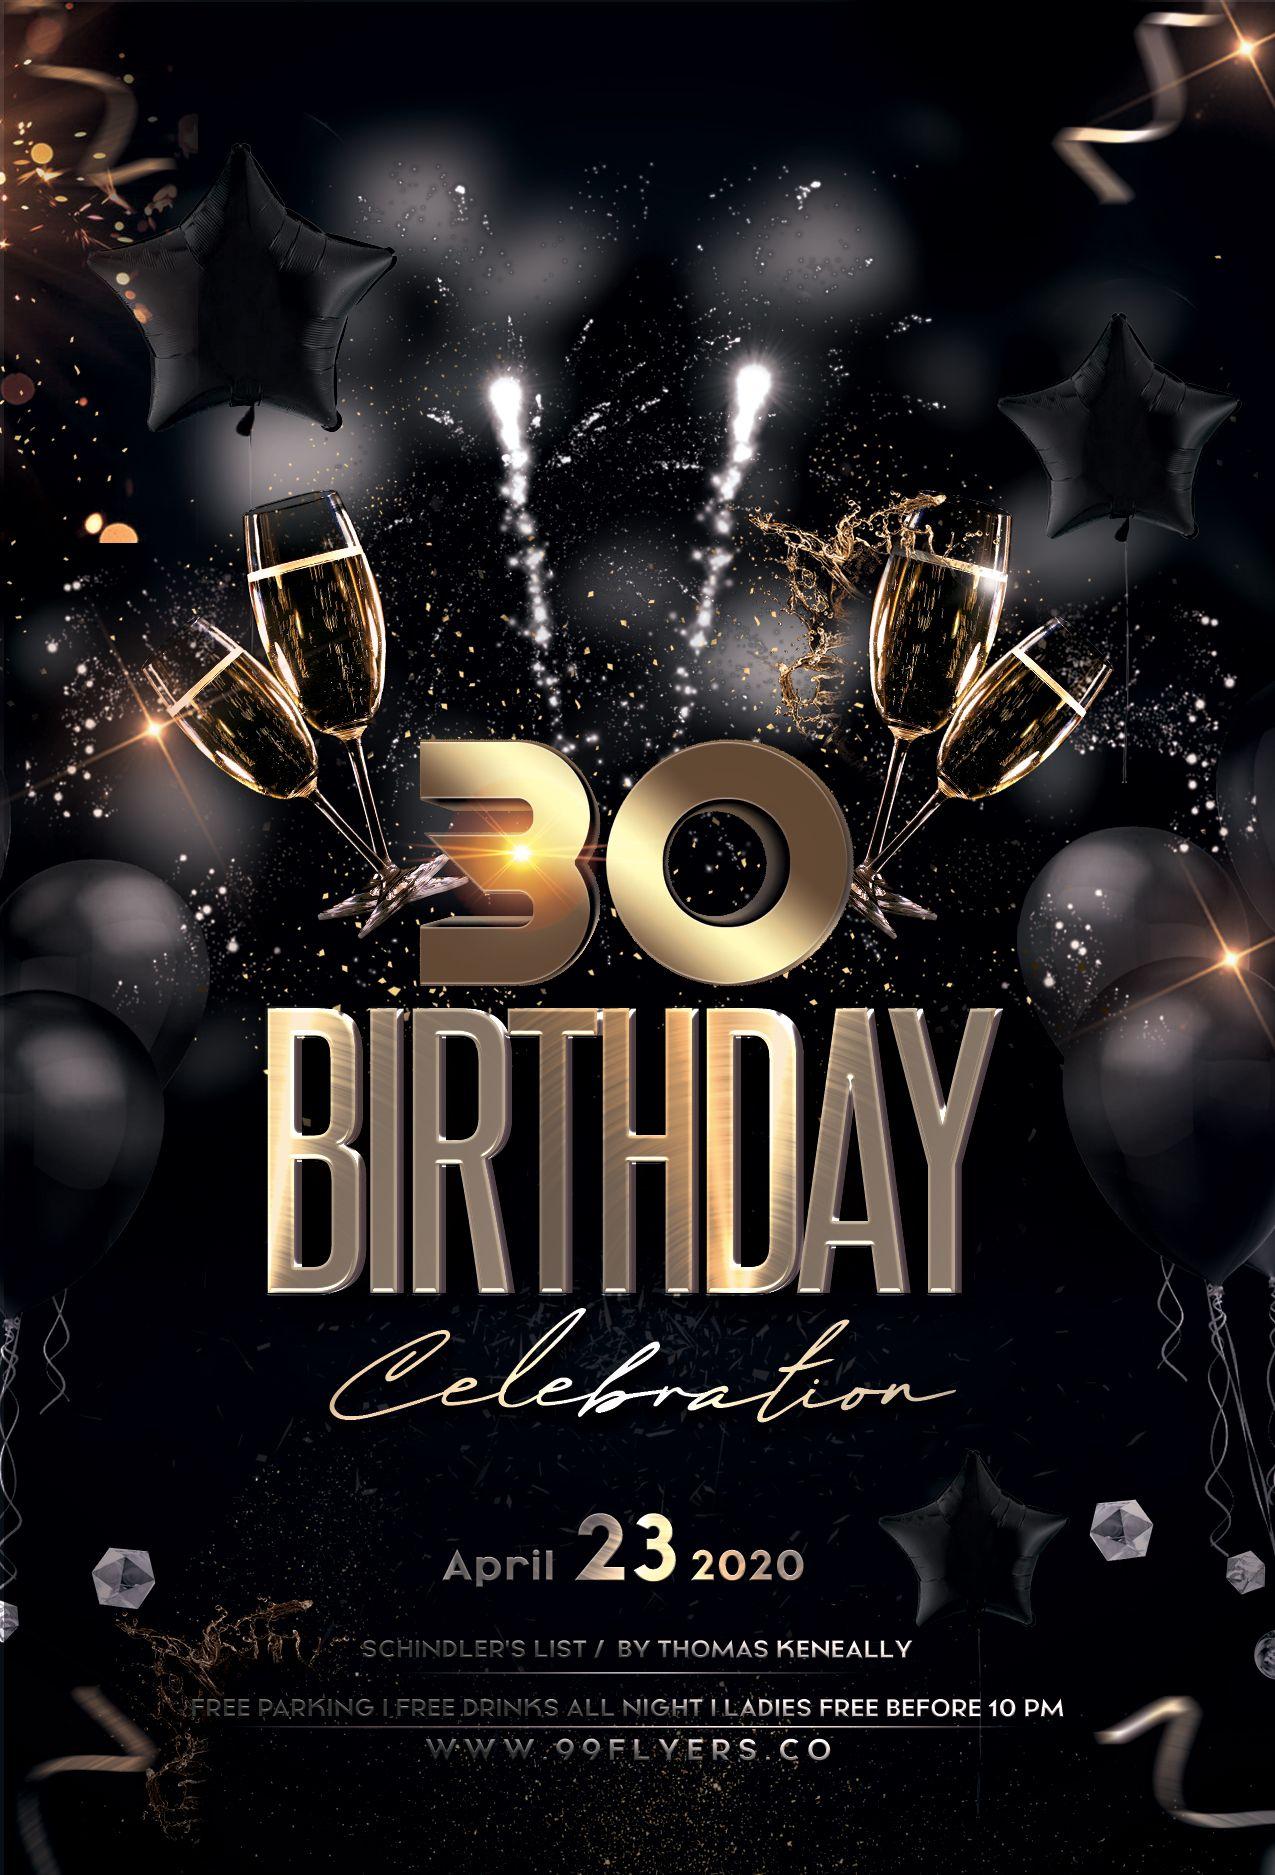 Birthday Bash Gold Black Free Psd Flyer Birthday Flyer Free Psd Flyer Templates Party Flyer Party flyer templates free downloads